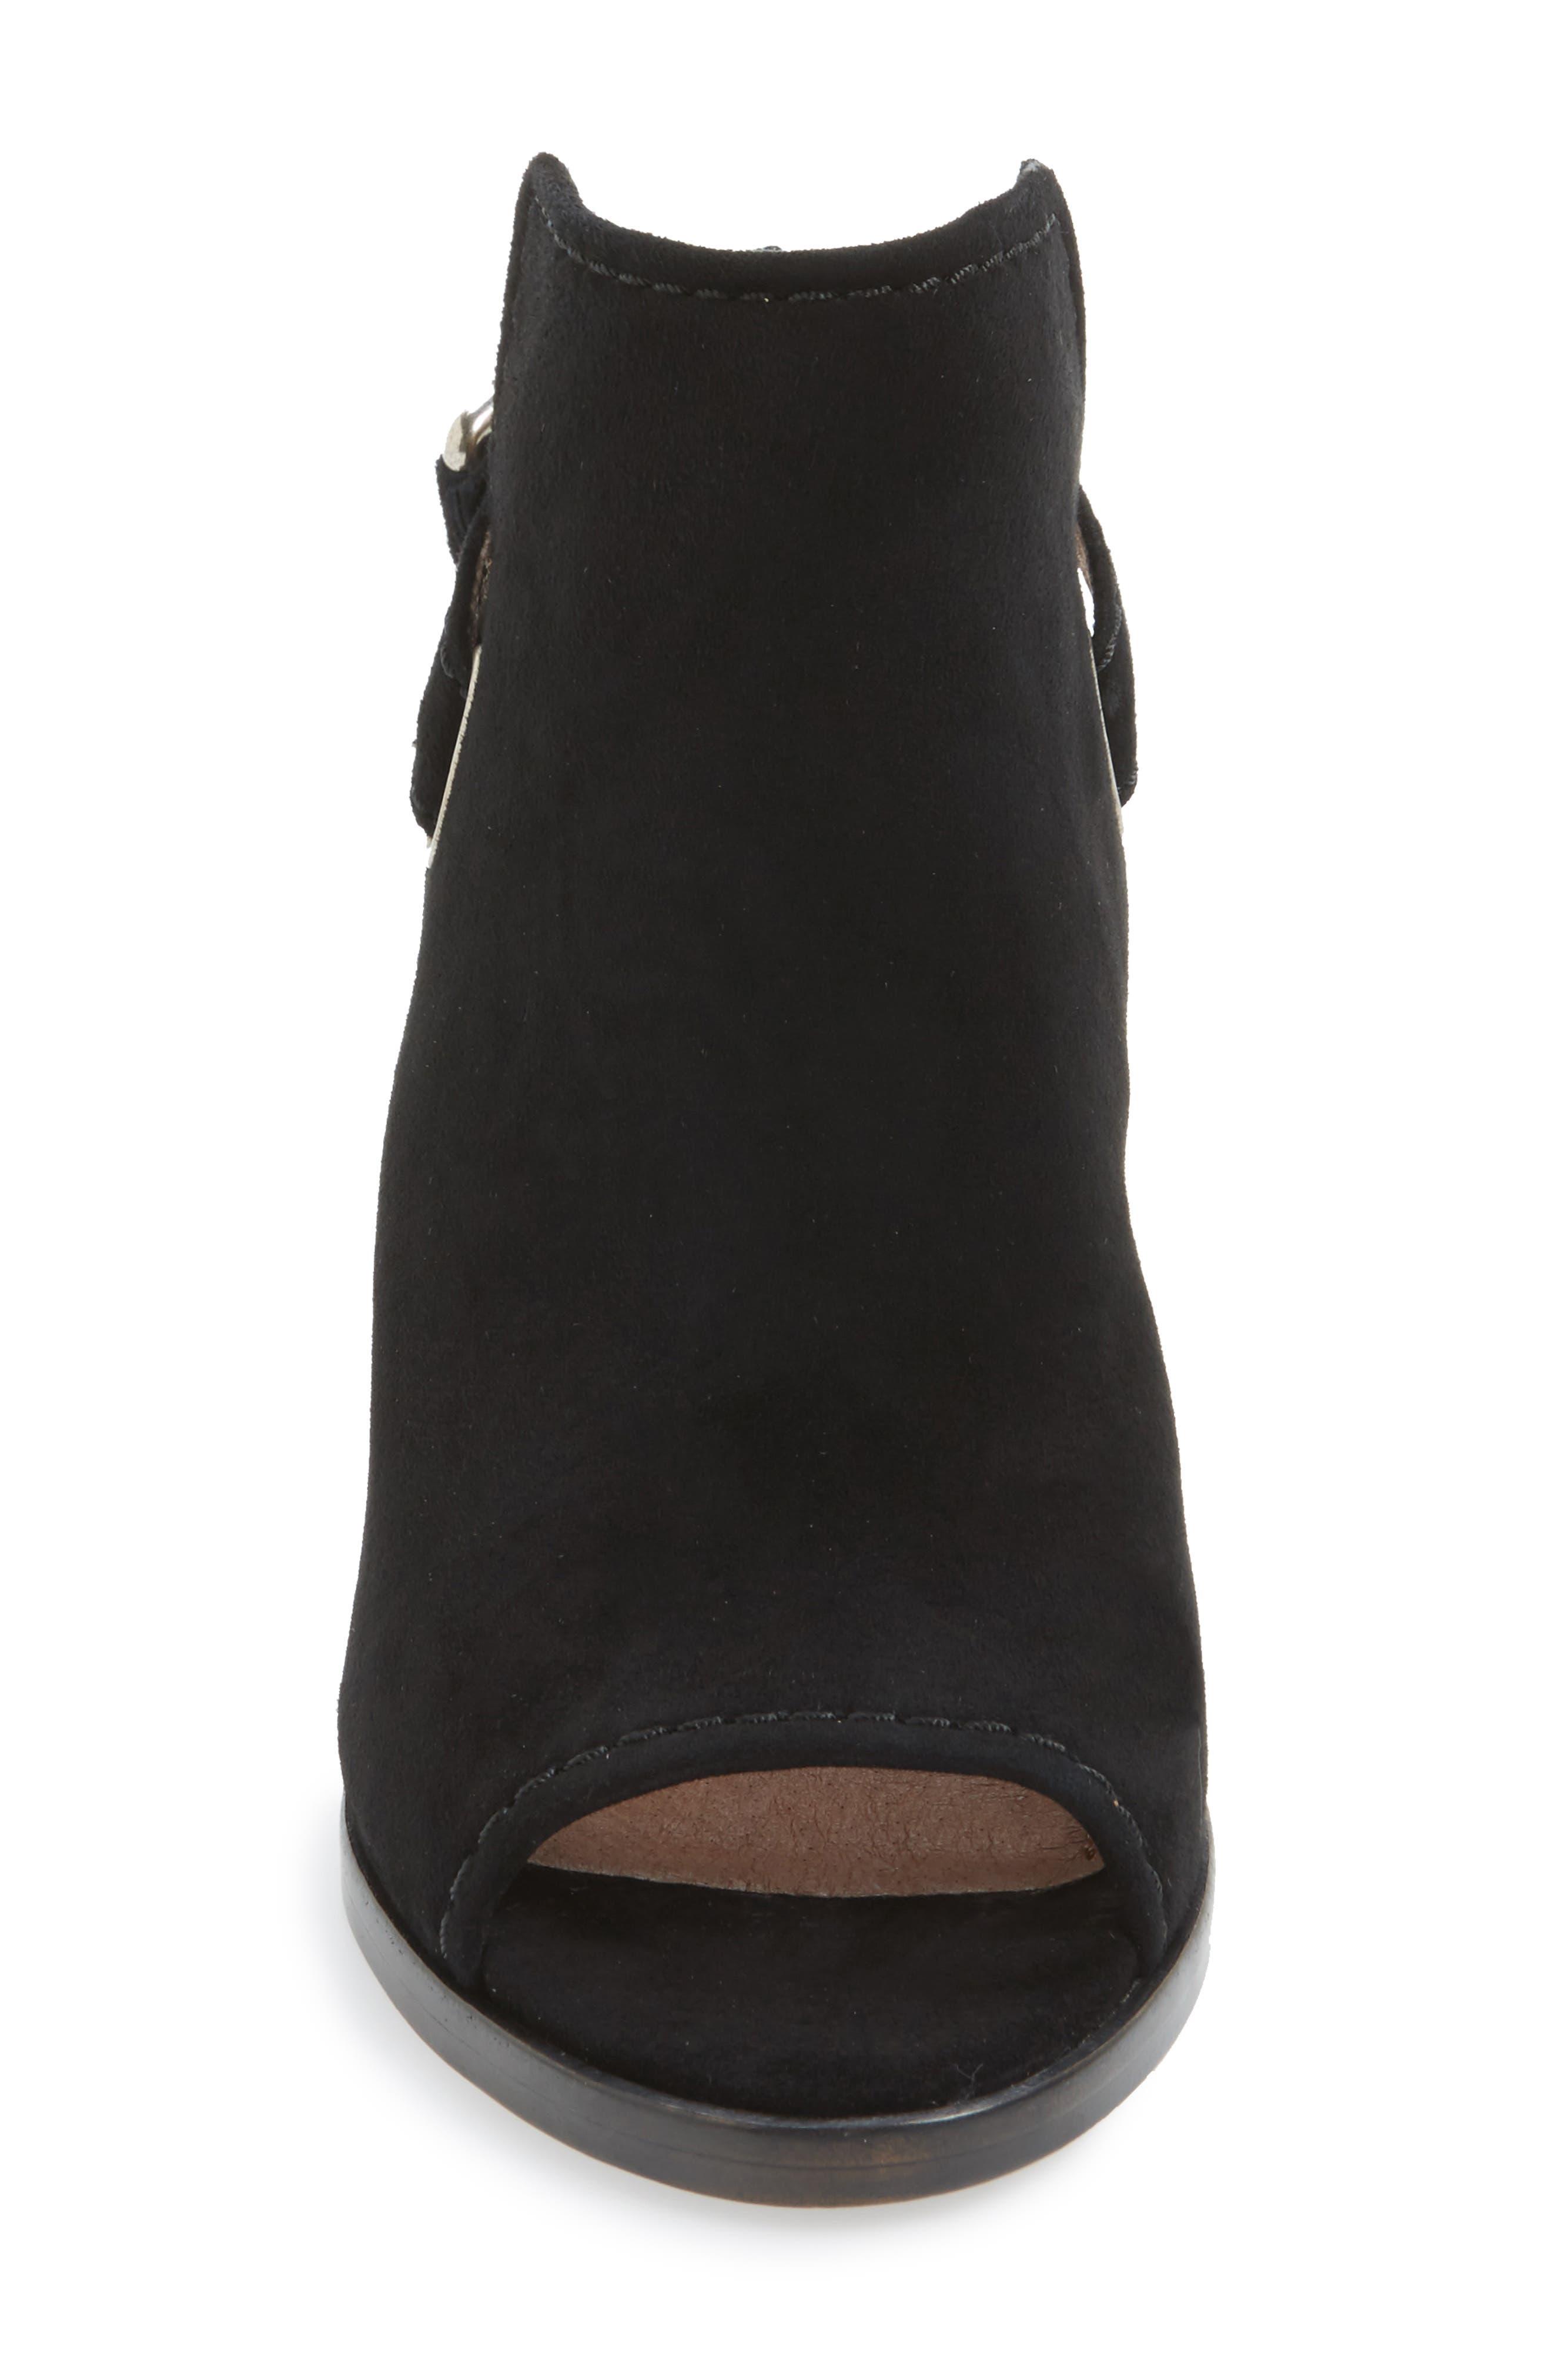 FRYE,                             'Dani Shield' Sandal,                             Alternate thumbnail 6, color,                             001